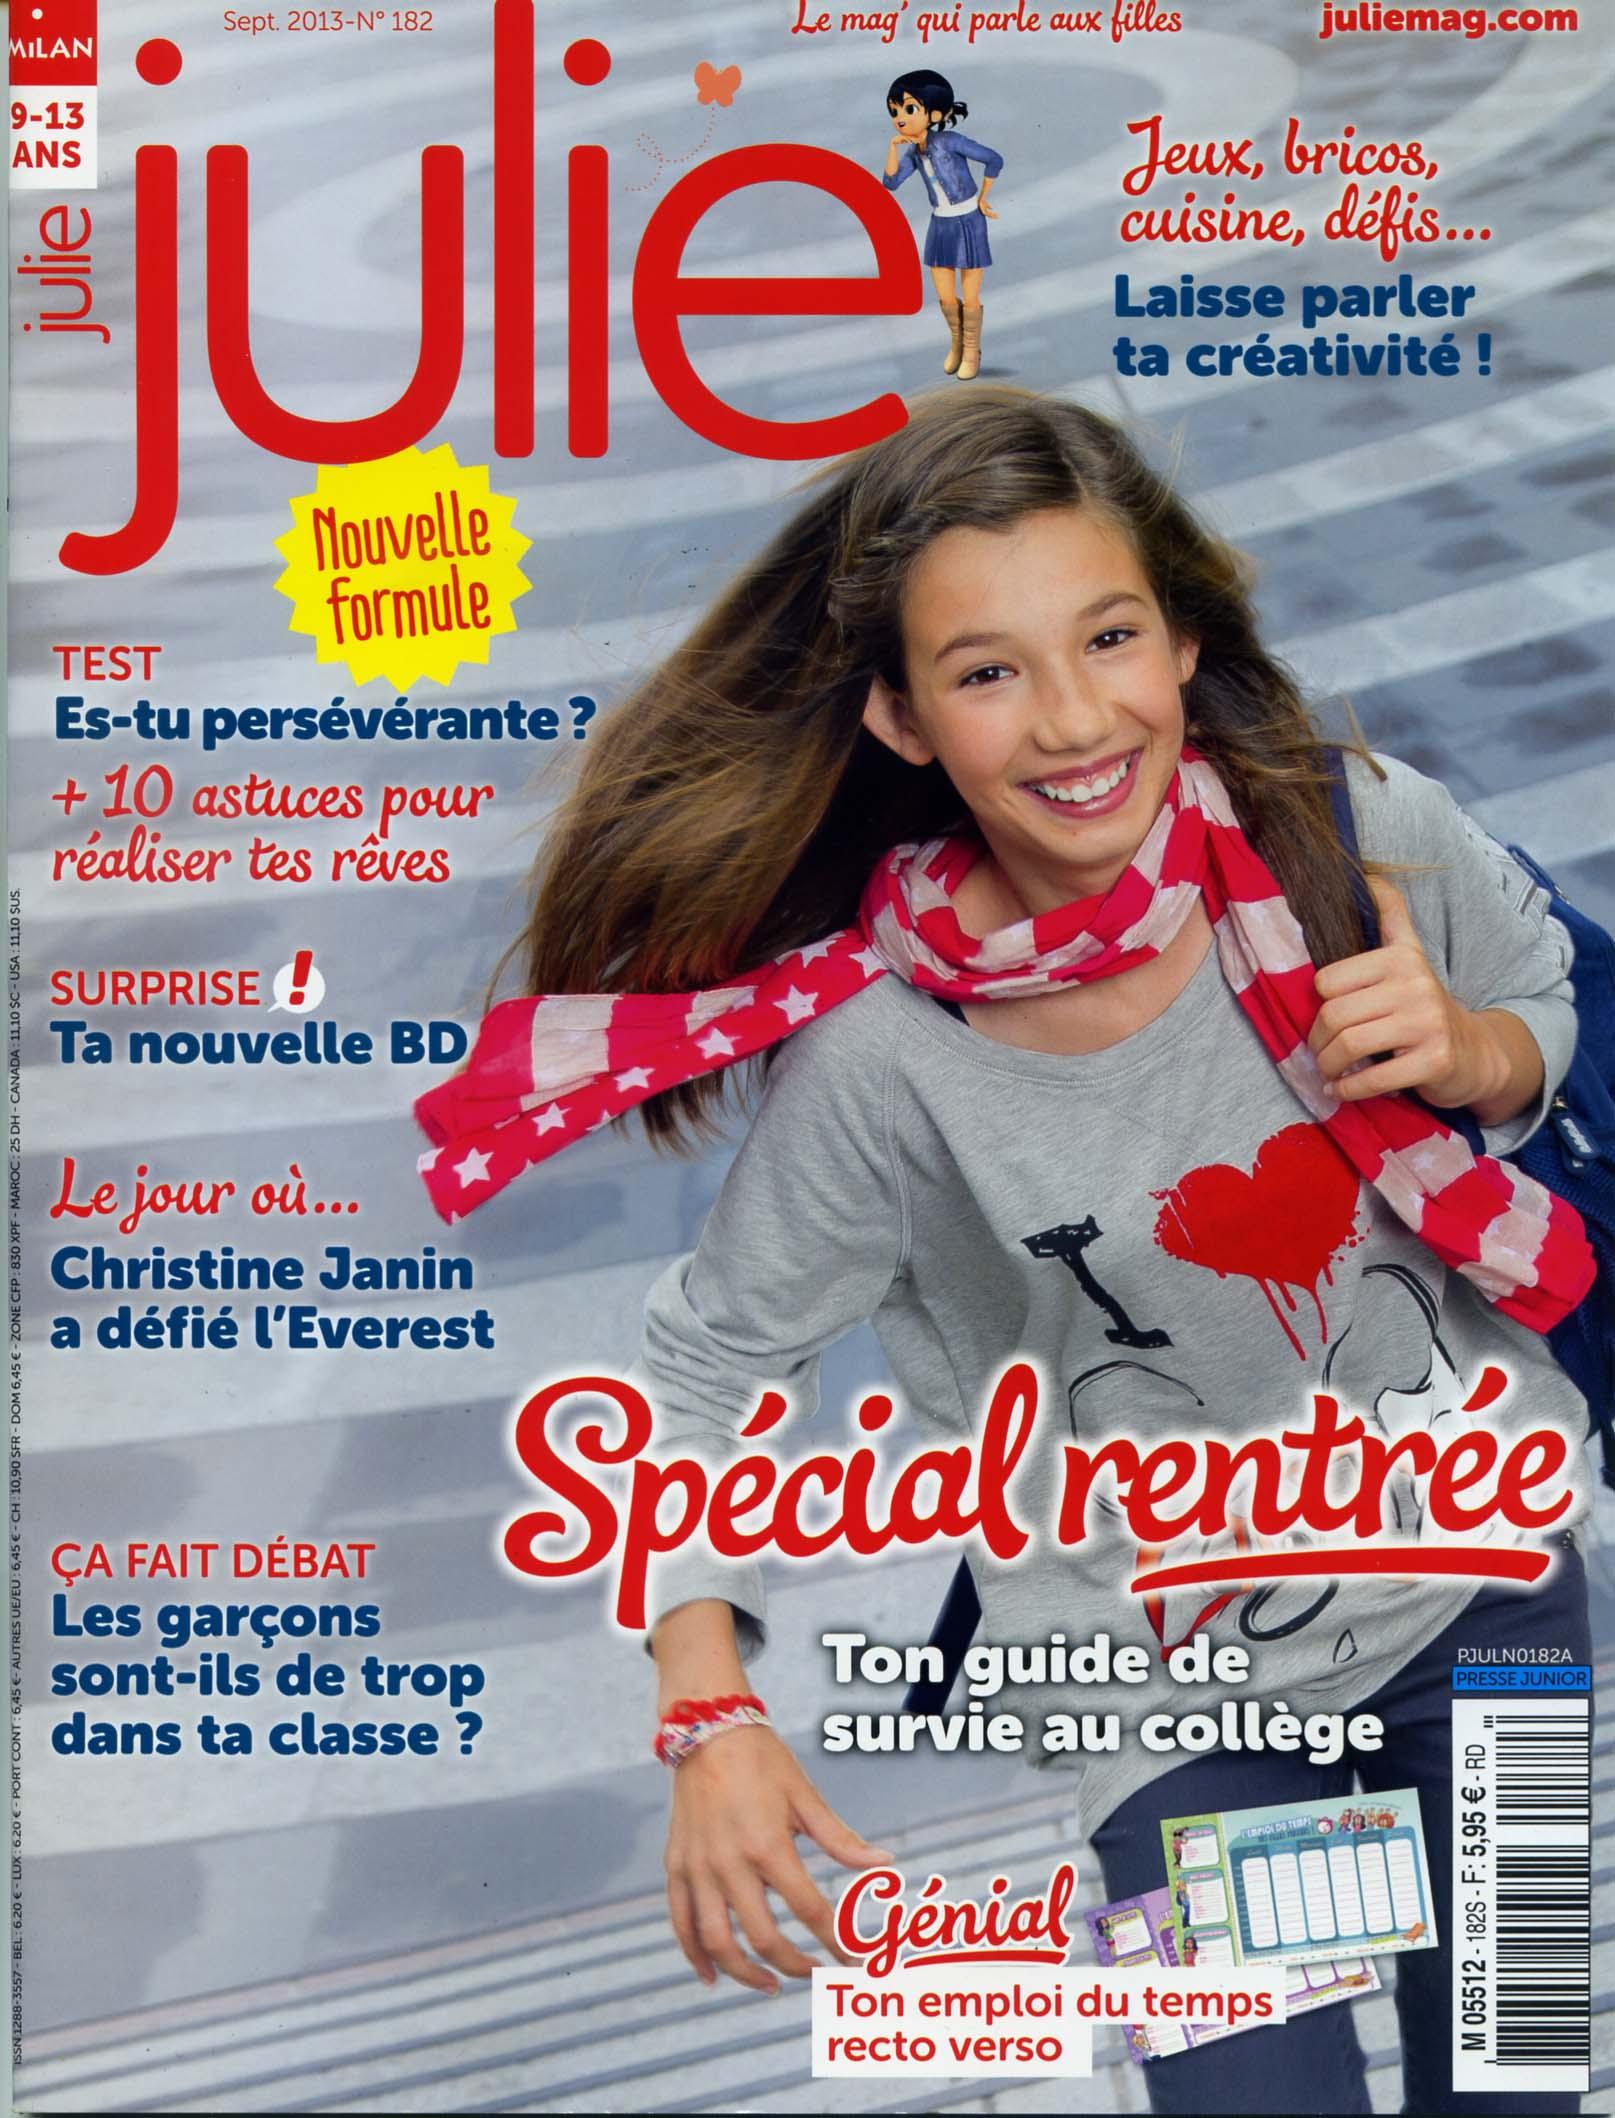 collegien-julie-cover-sept13.jpg